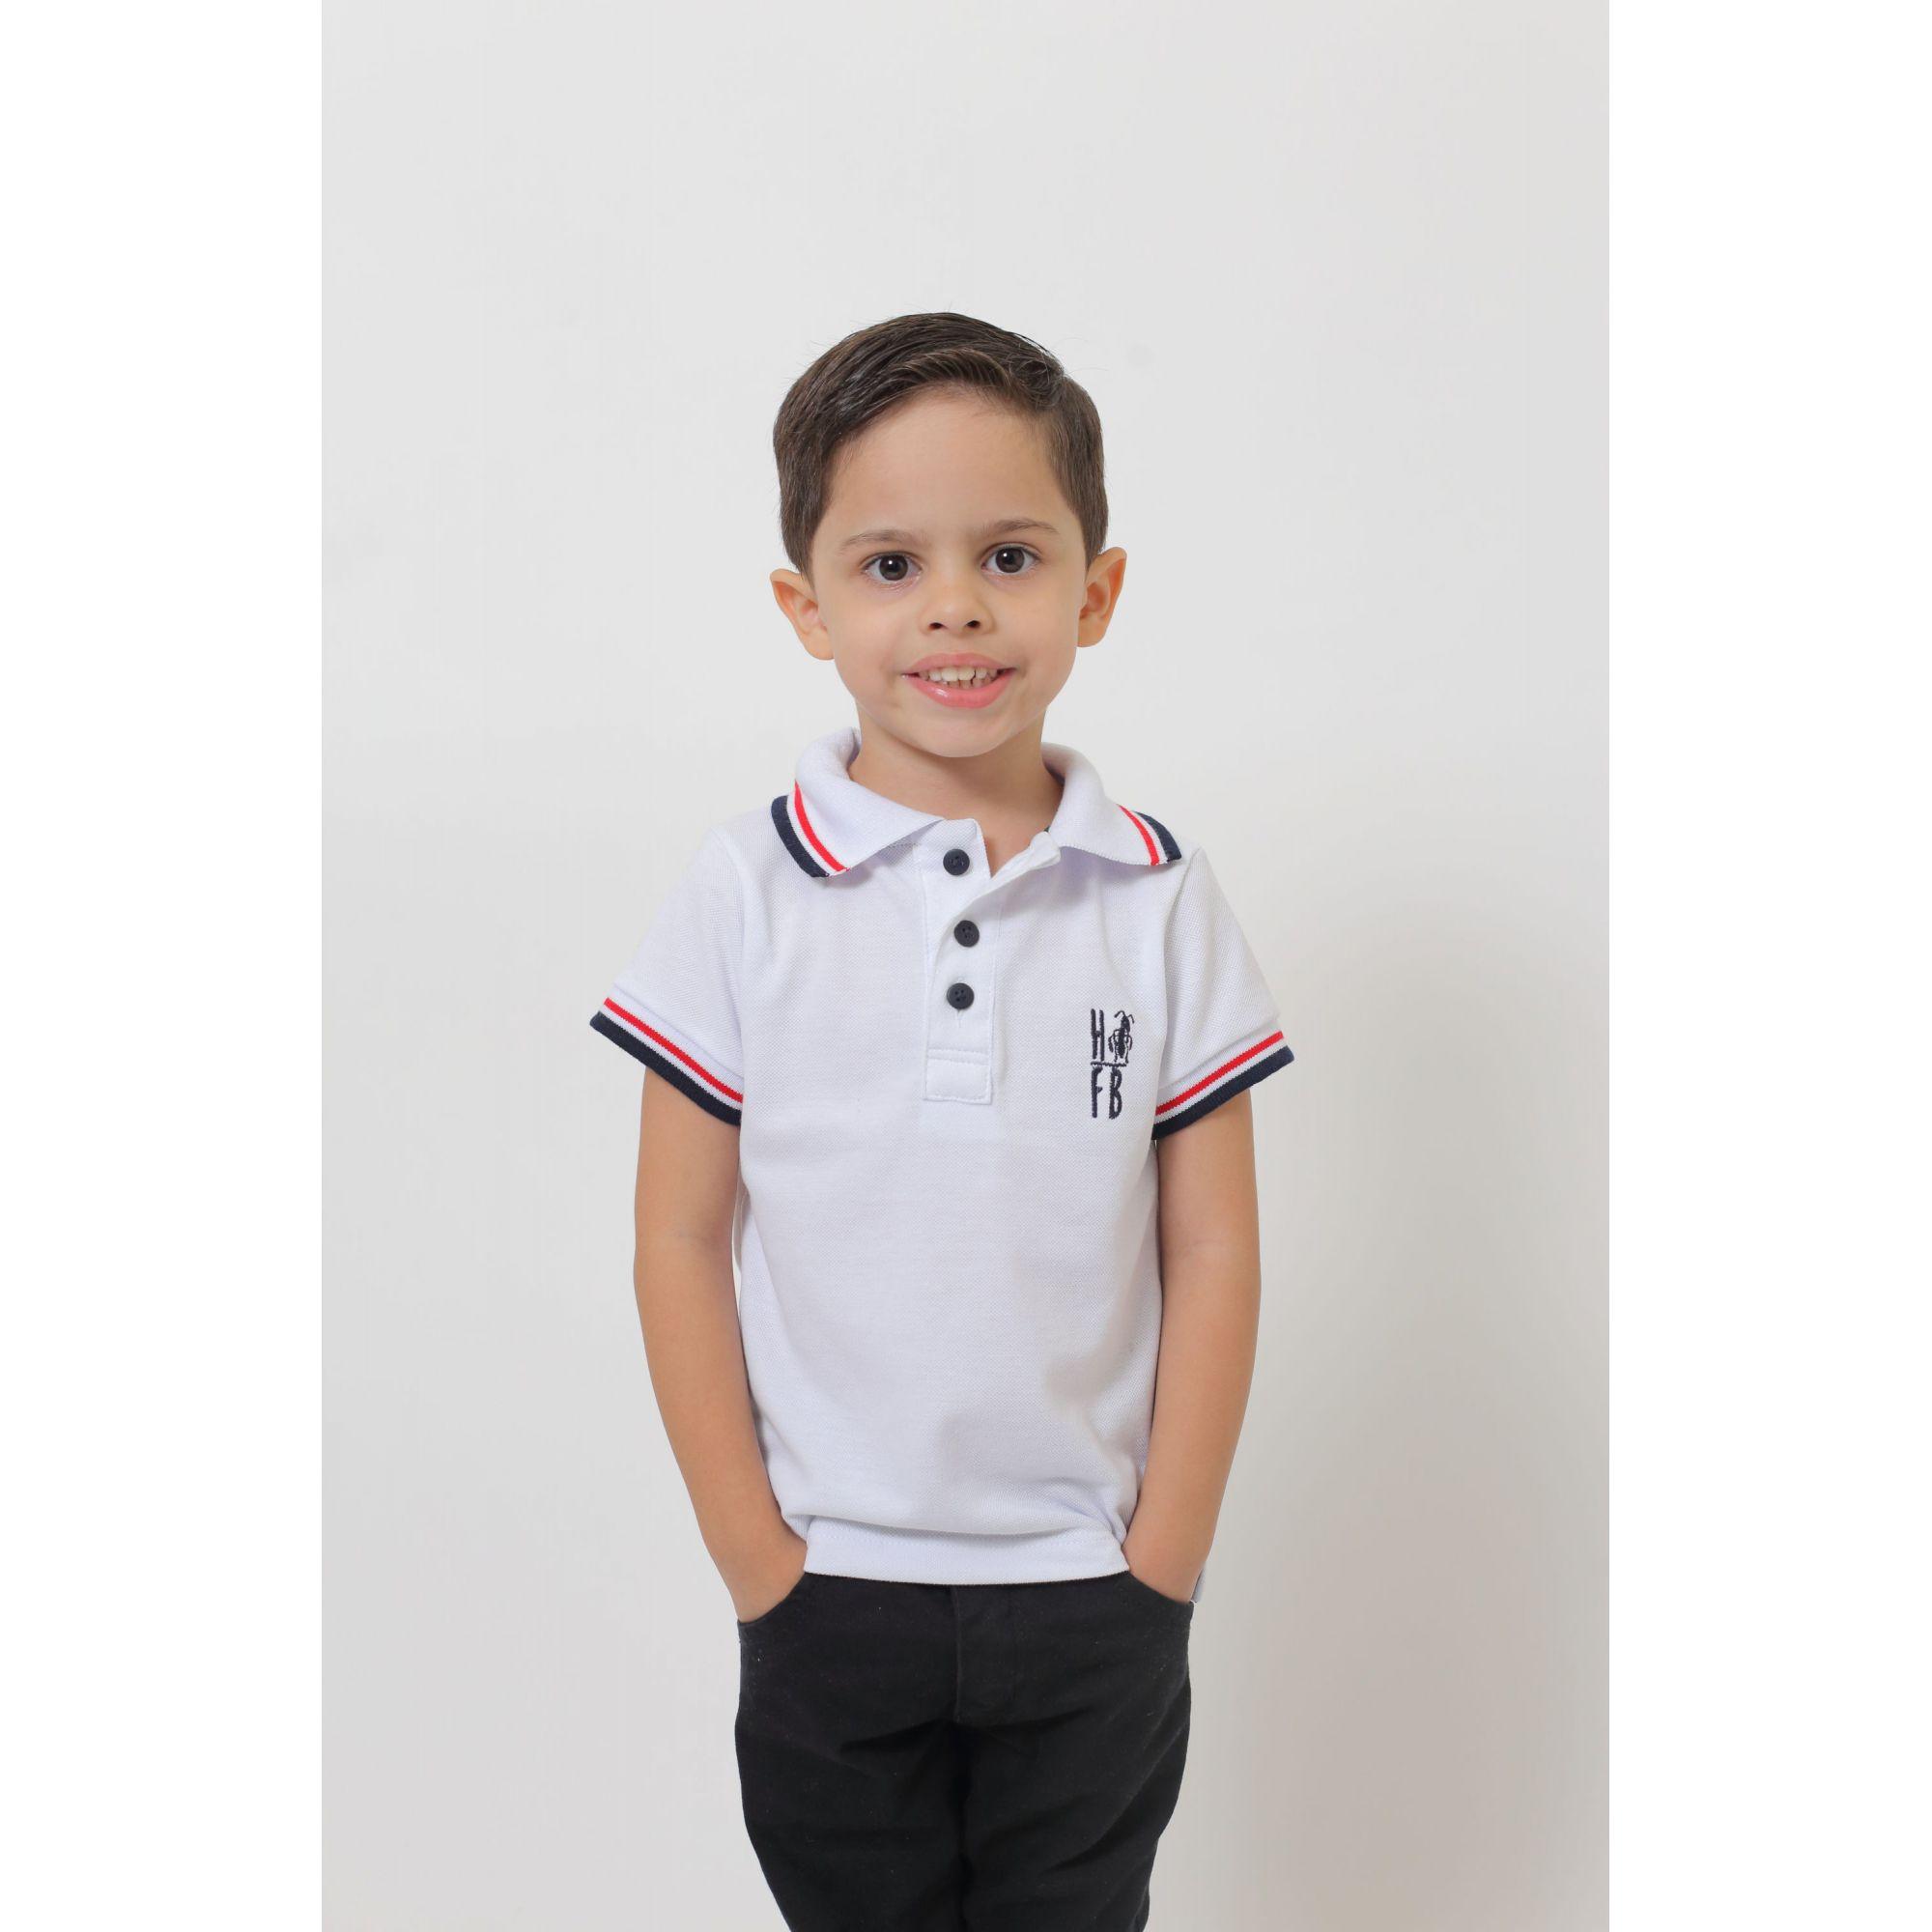 MÃE E FILHO > Kit 02 peças - Camisas ou Body Polo Branca   [Coleção Tal Mãe Tal Filho]  - Heitor Fashion Brazil